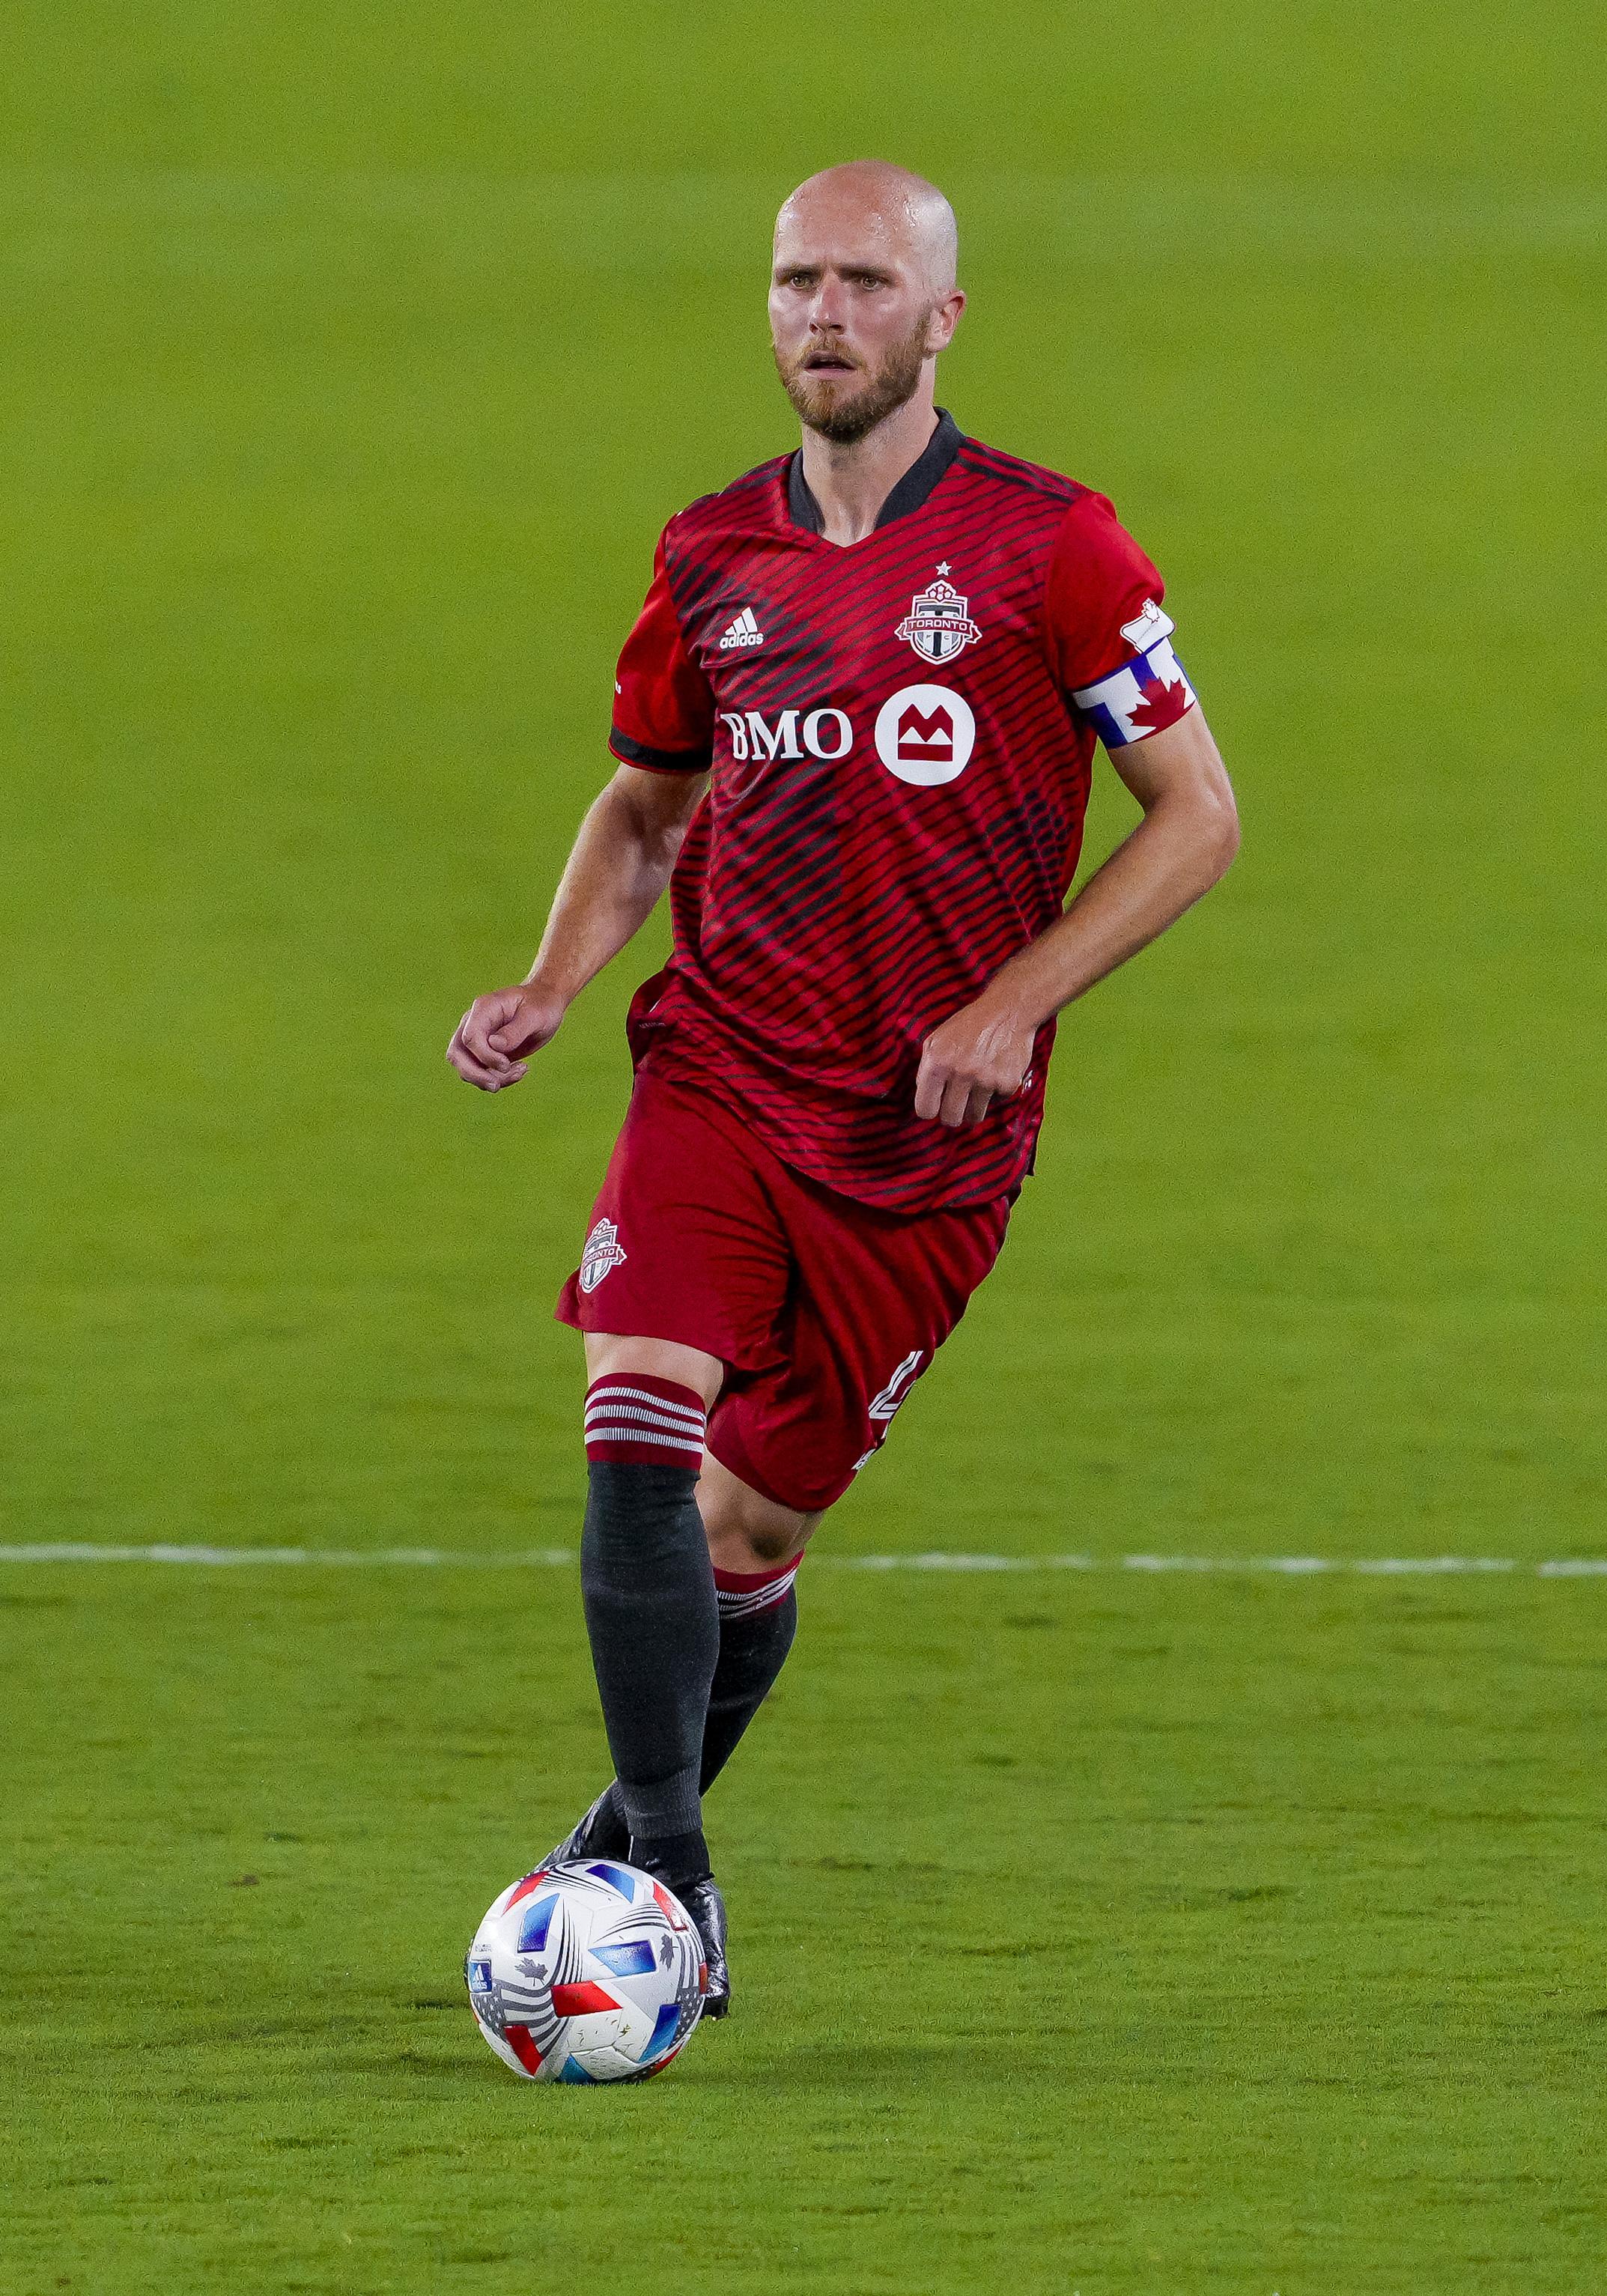 SOCCER: MAY 12 MLS - Columbus Crew SC at Toronto FC